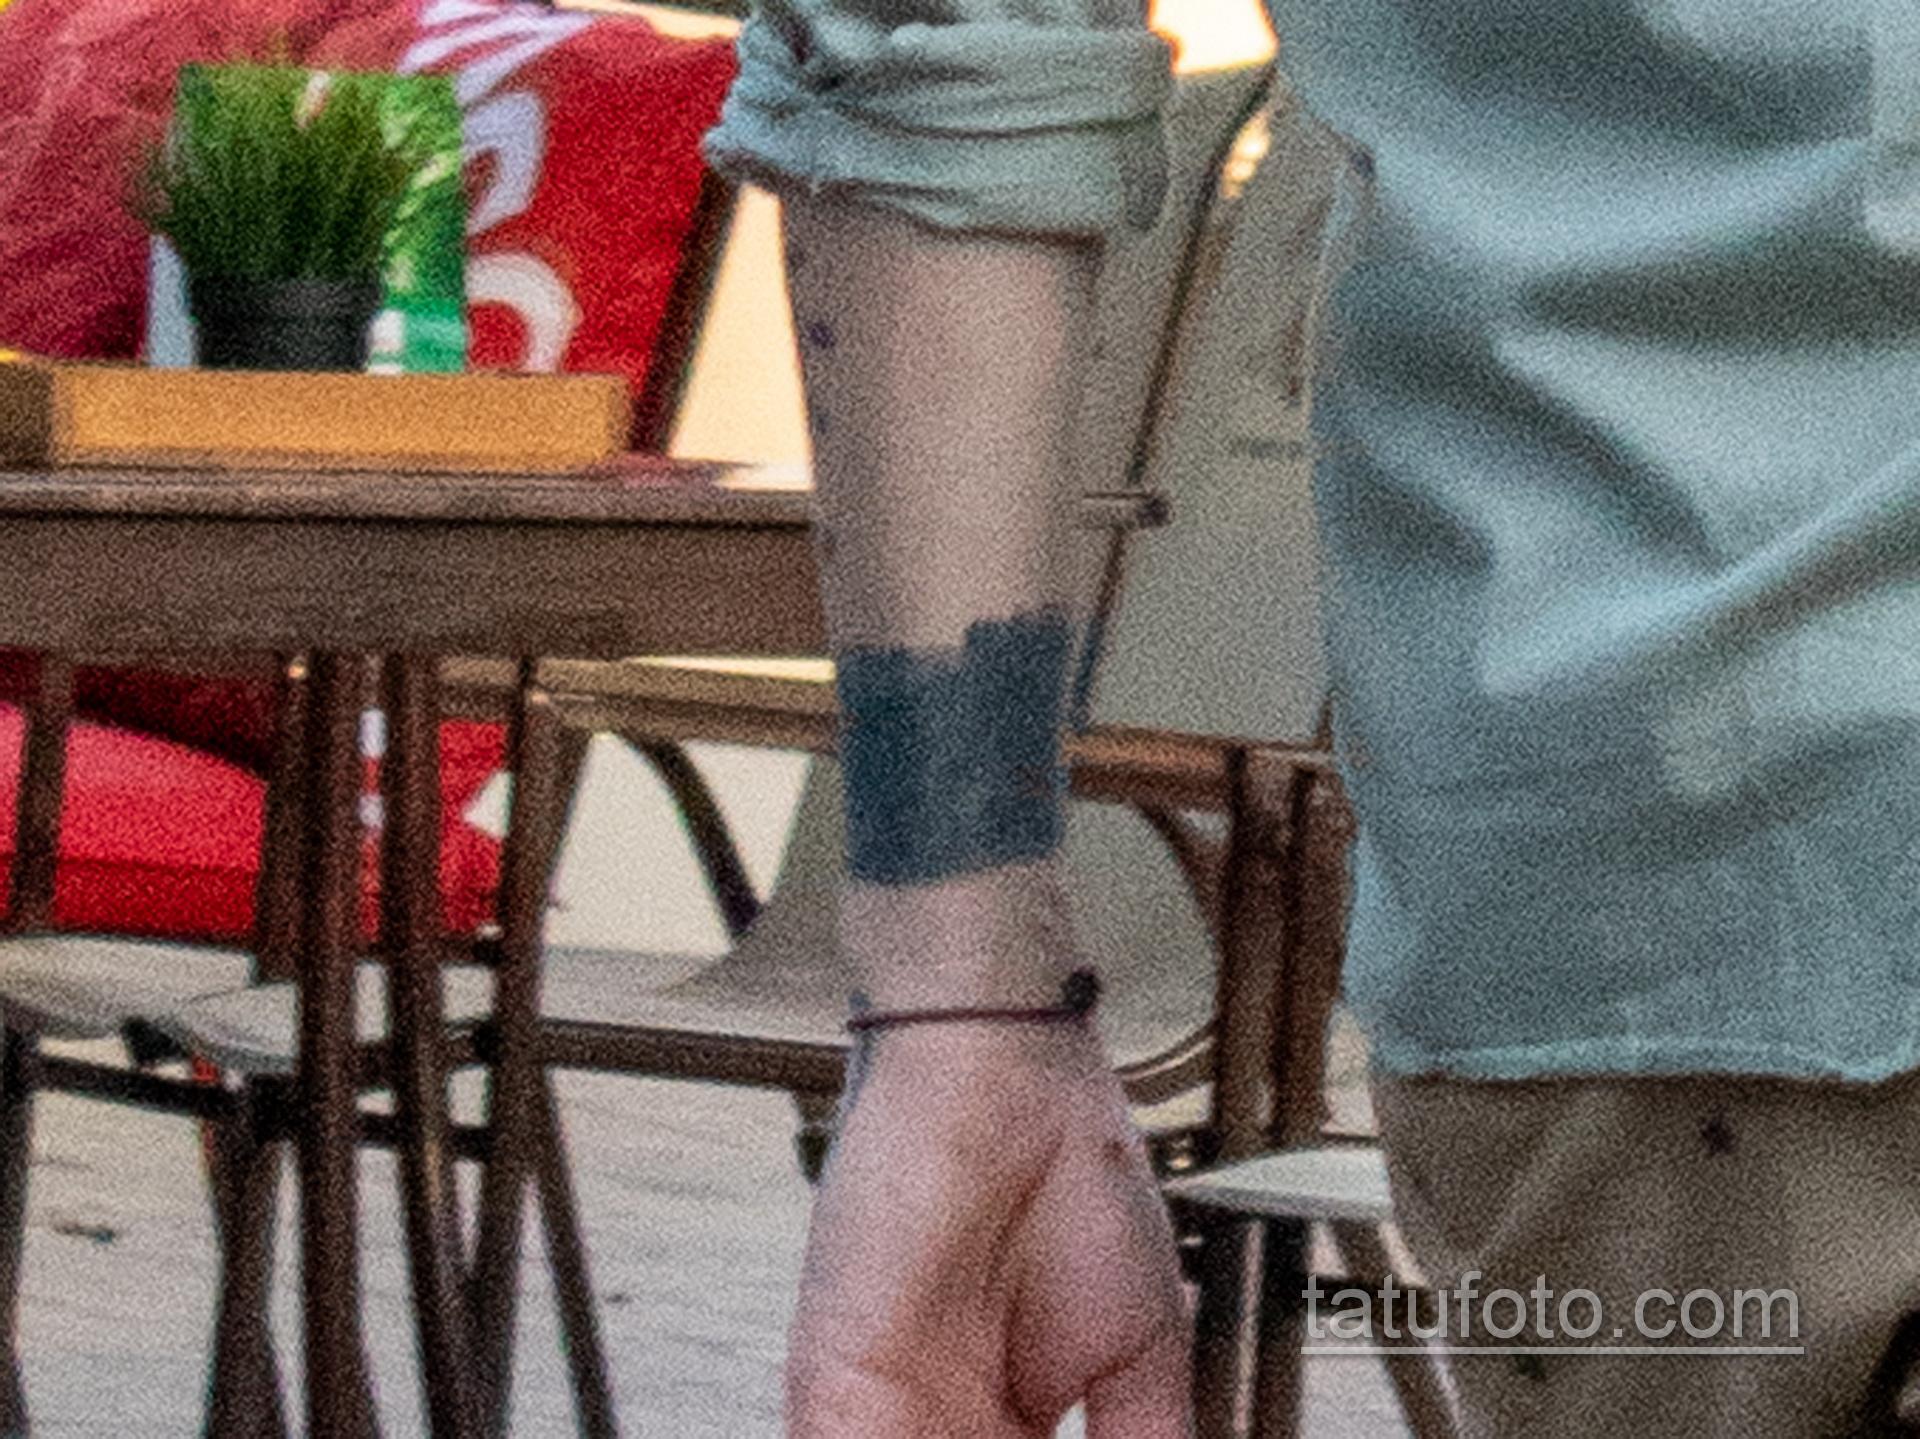 тату черная полоса на руке парня 2